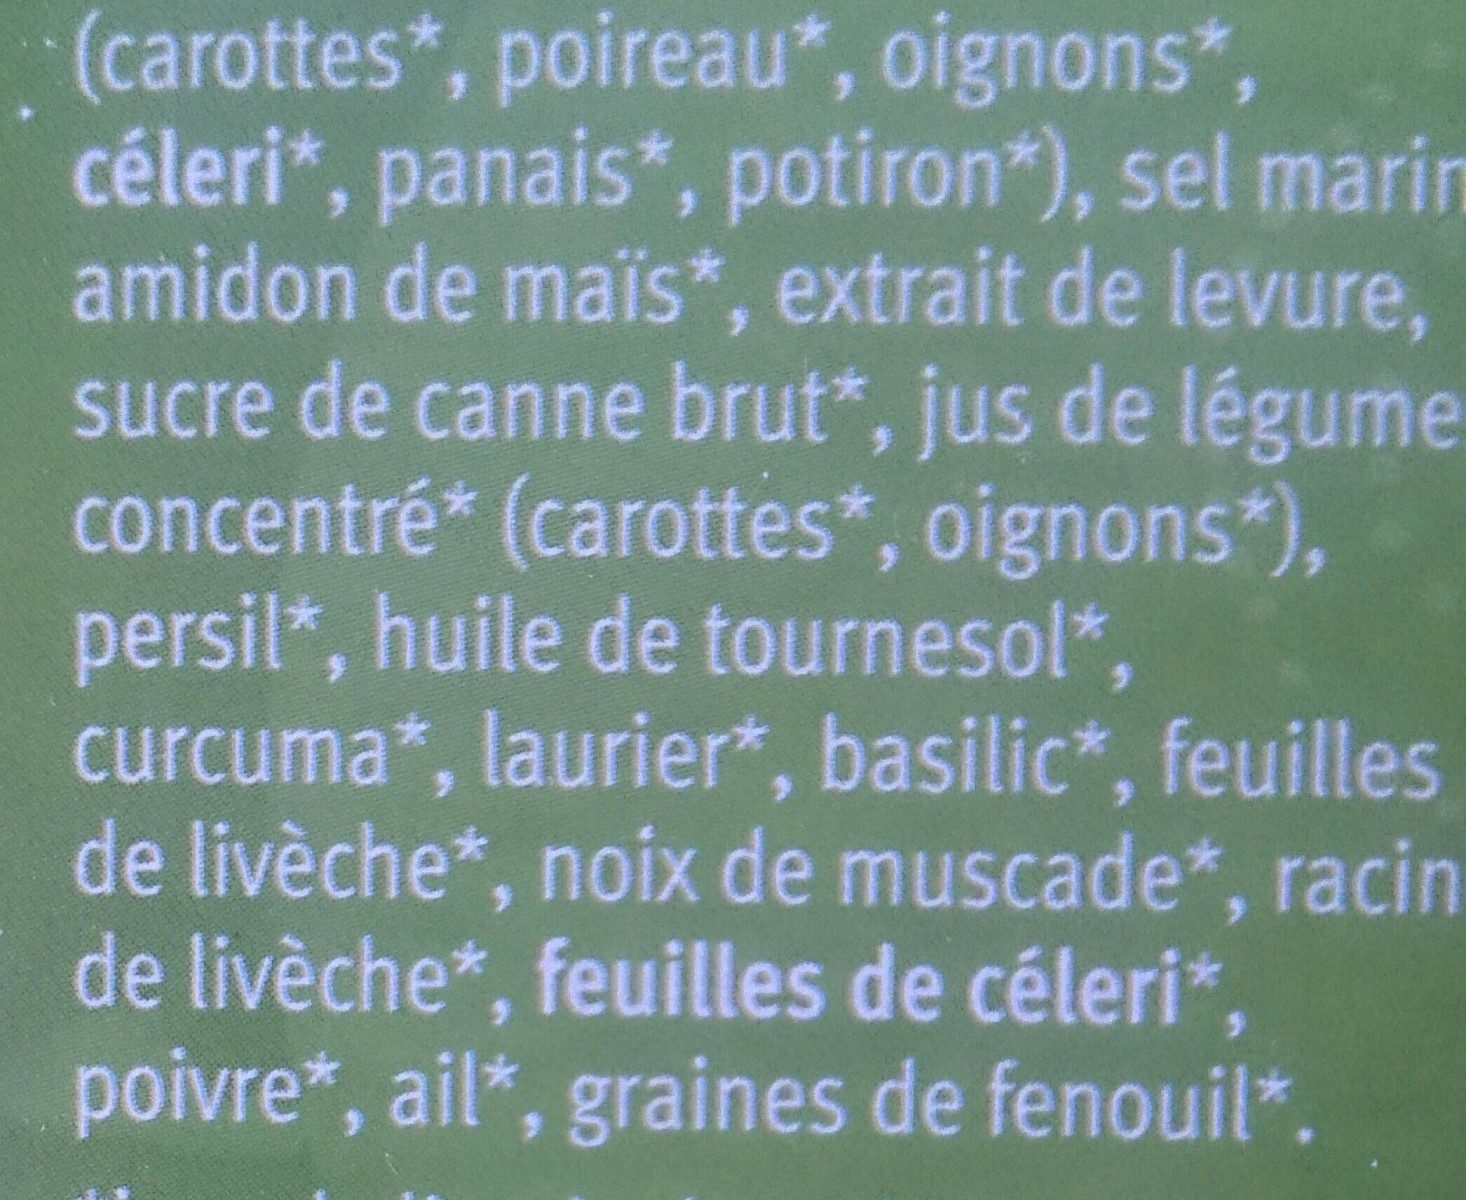 Natur Compagnie Drink Bouillon Rocking Veggie - Ingrédients - fr